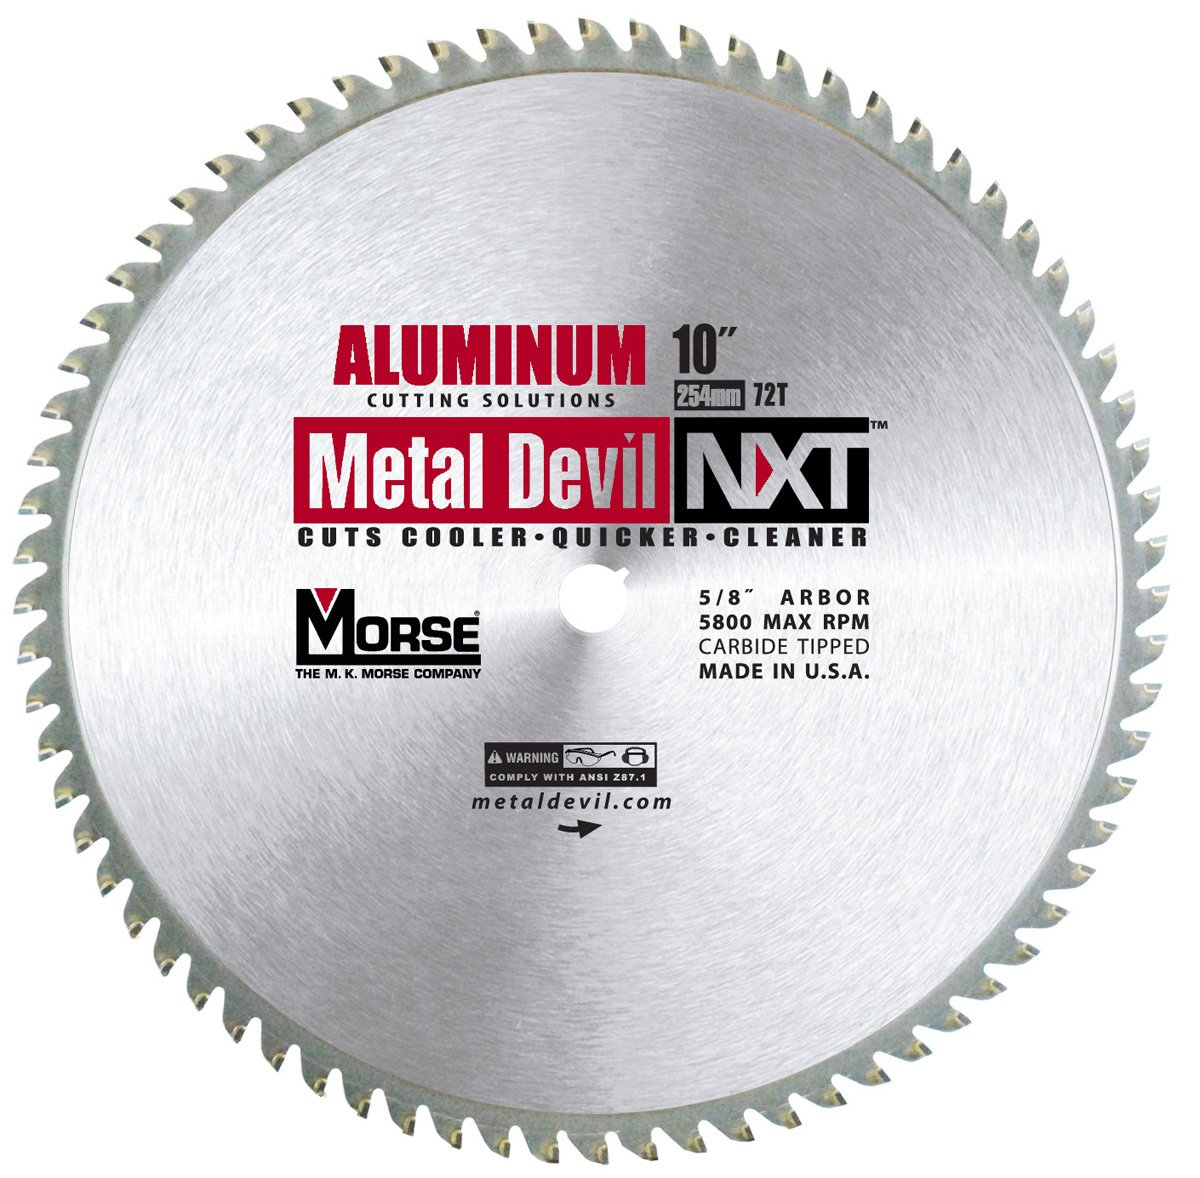 MK Morse CSM1072NAC Metal Devil Circular Saw Blade, Aluminum Application, 10-Inch Diameter, 72 TPI, 5/8-Inch Arbor